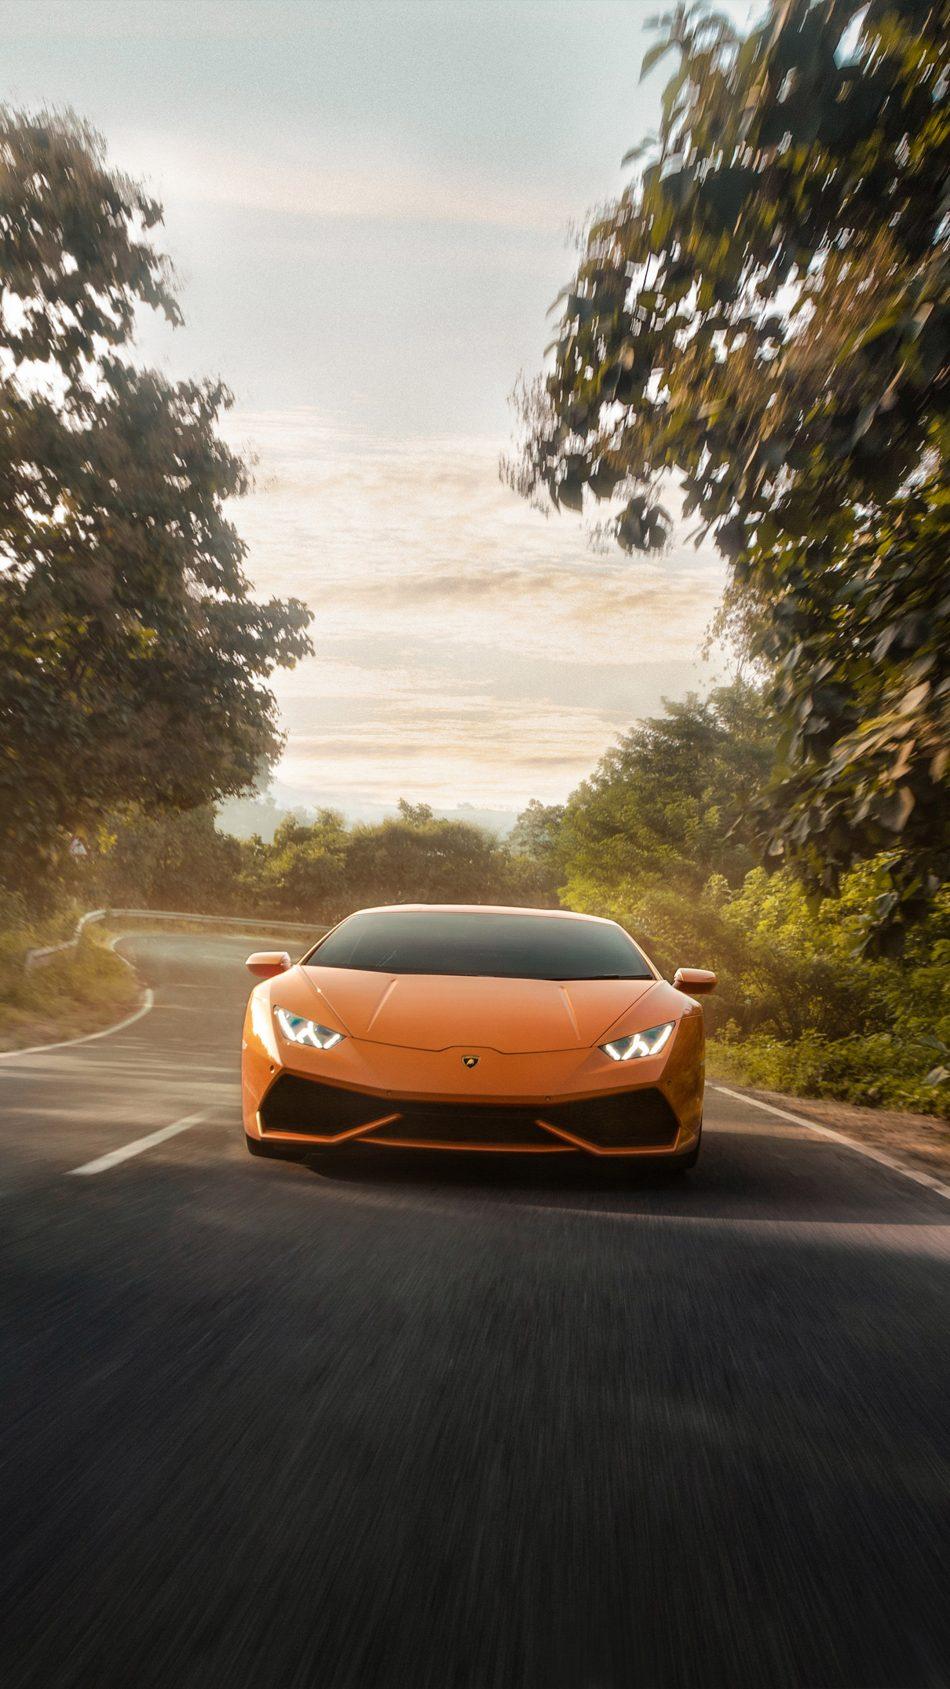 Lamborghini Huracan on Road 4K Ultra HD Mobile Wallpaper